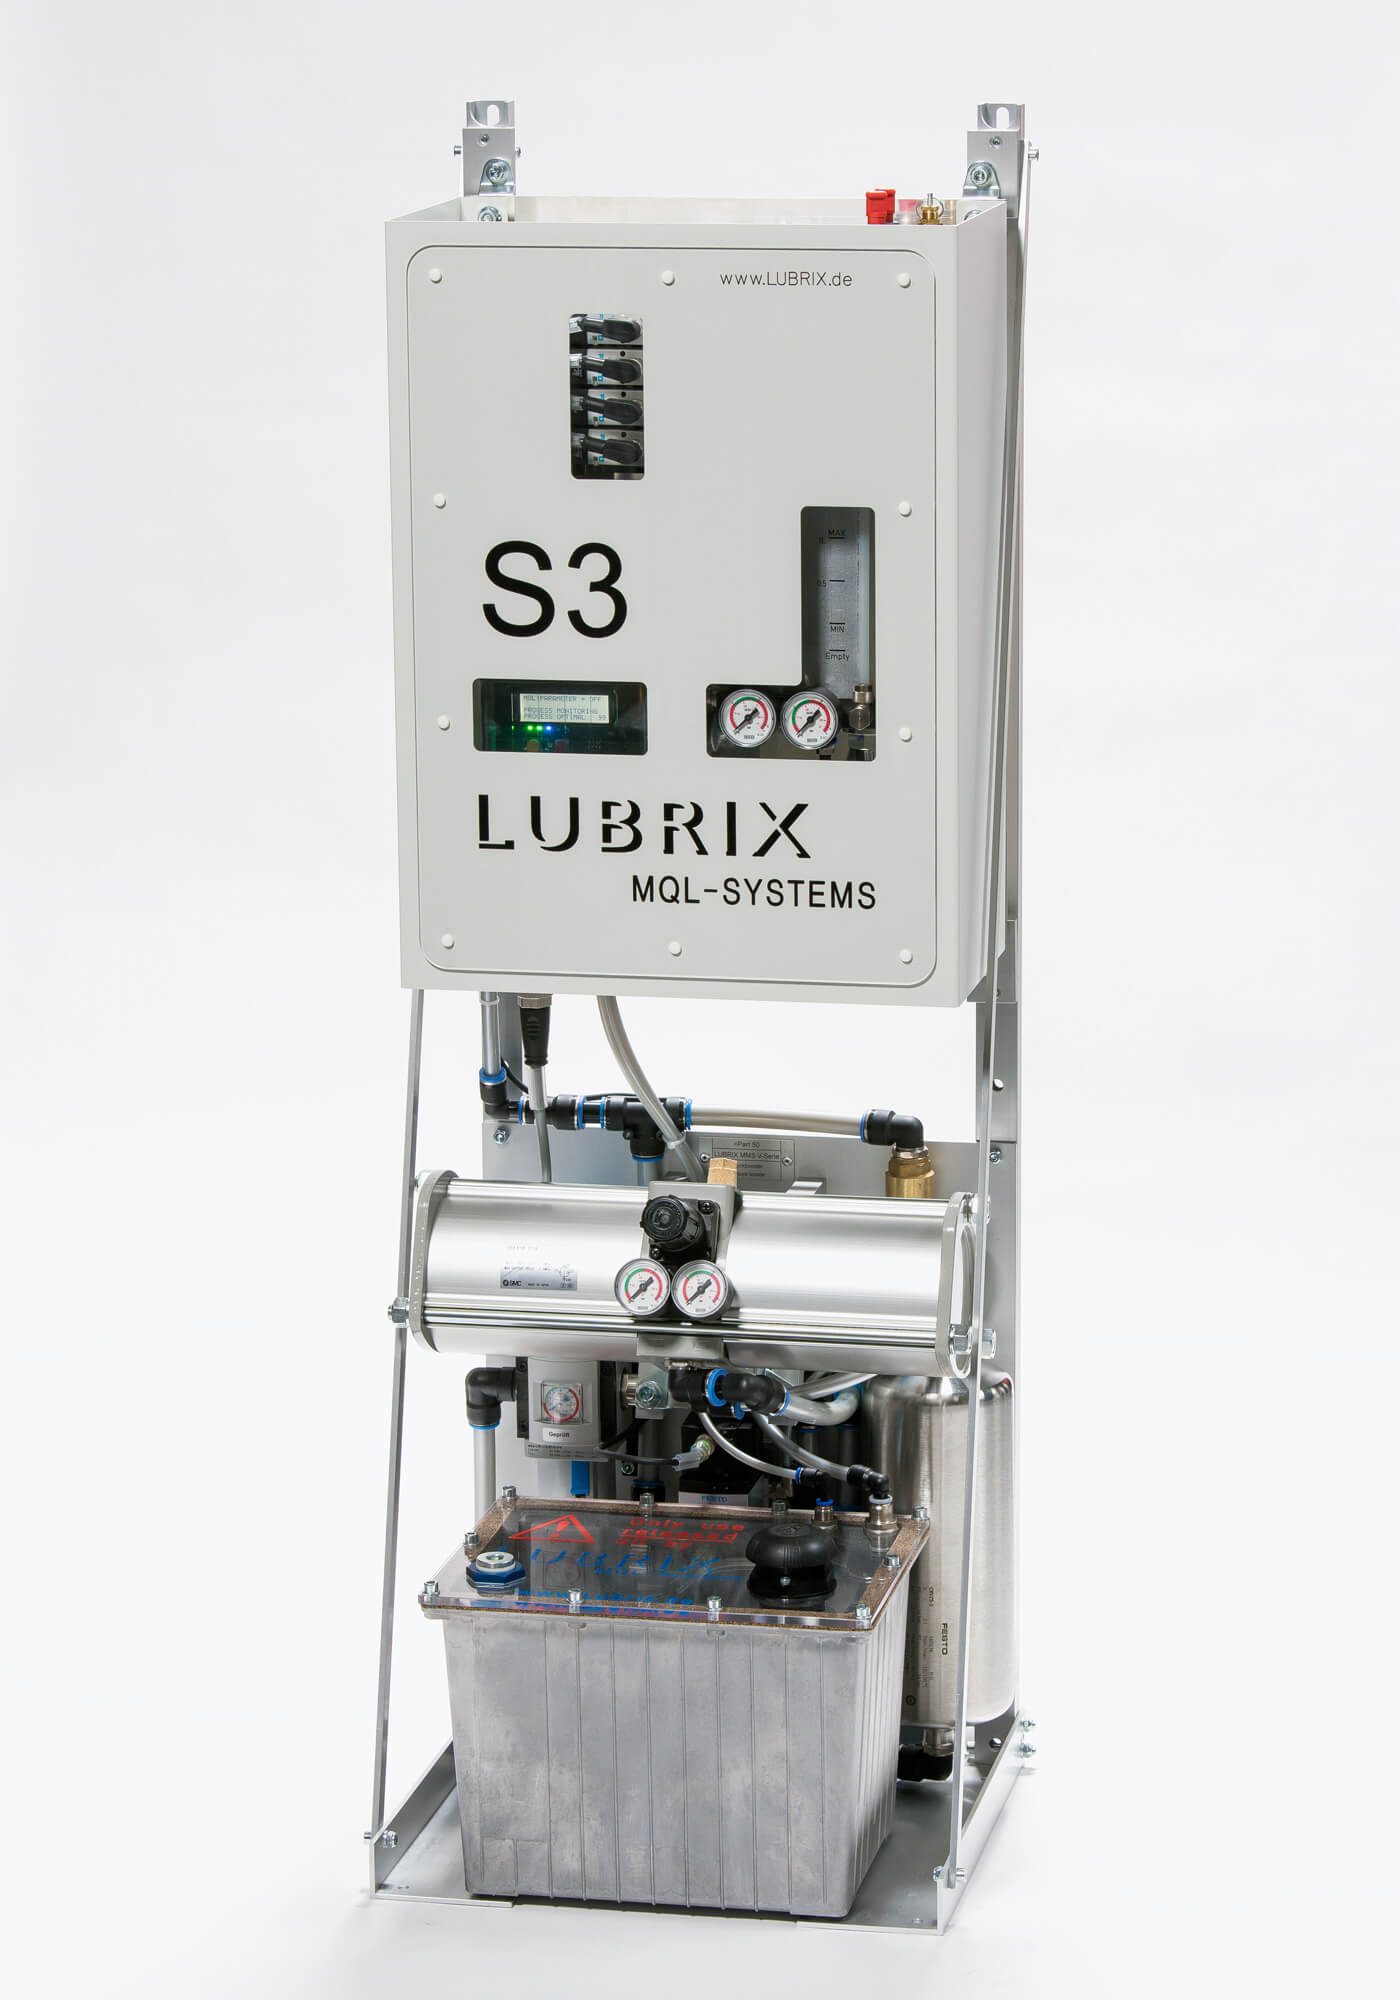 LUBRIX S3